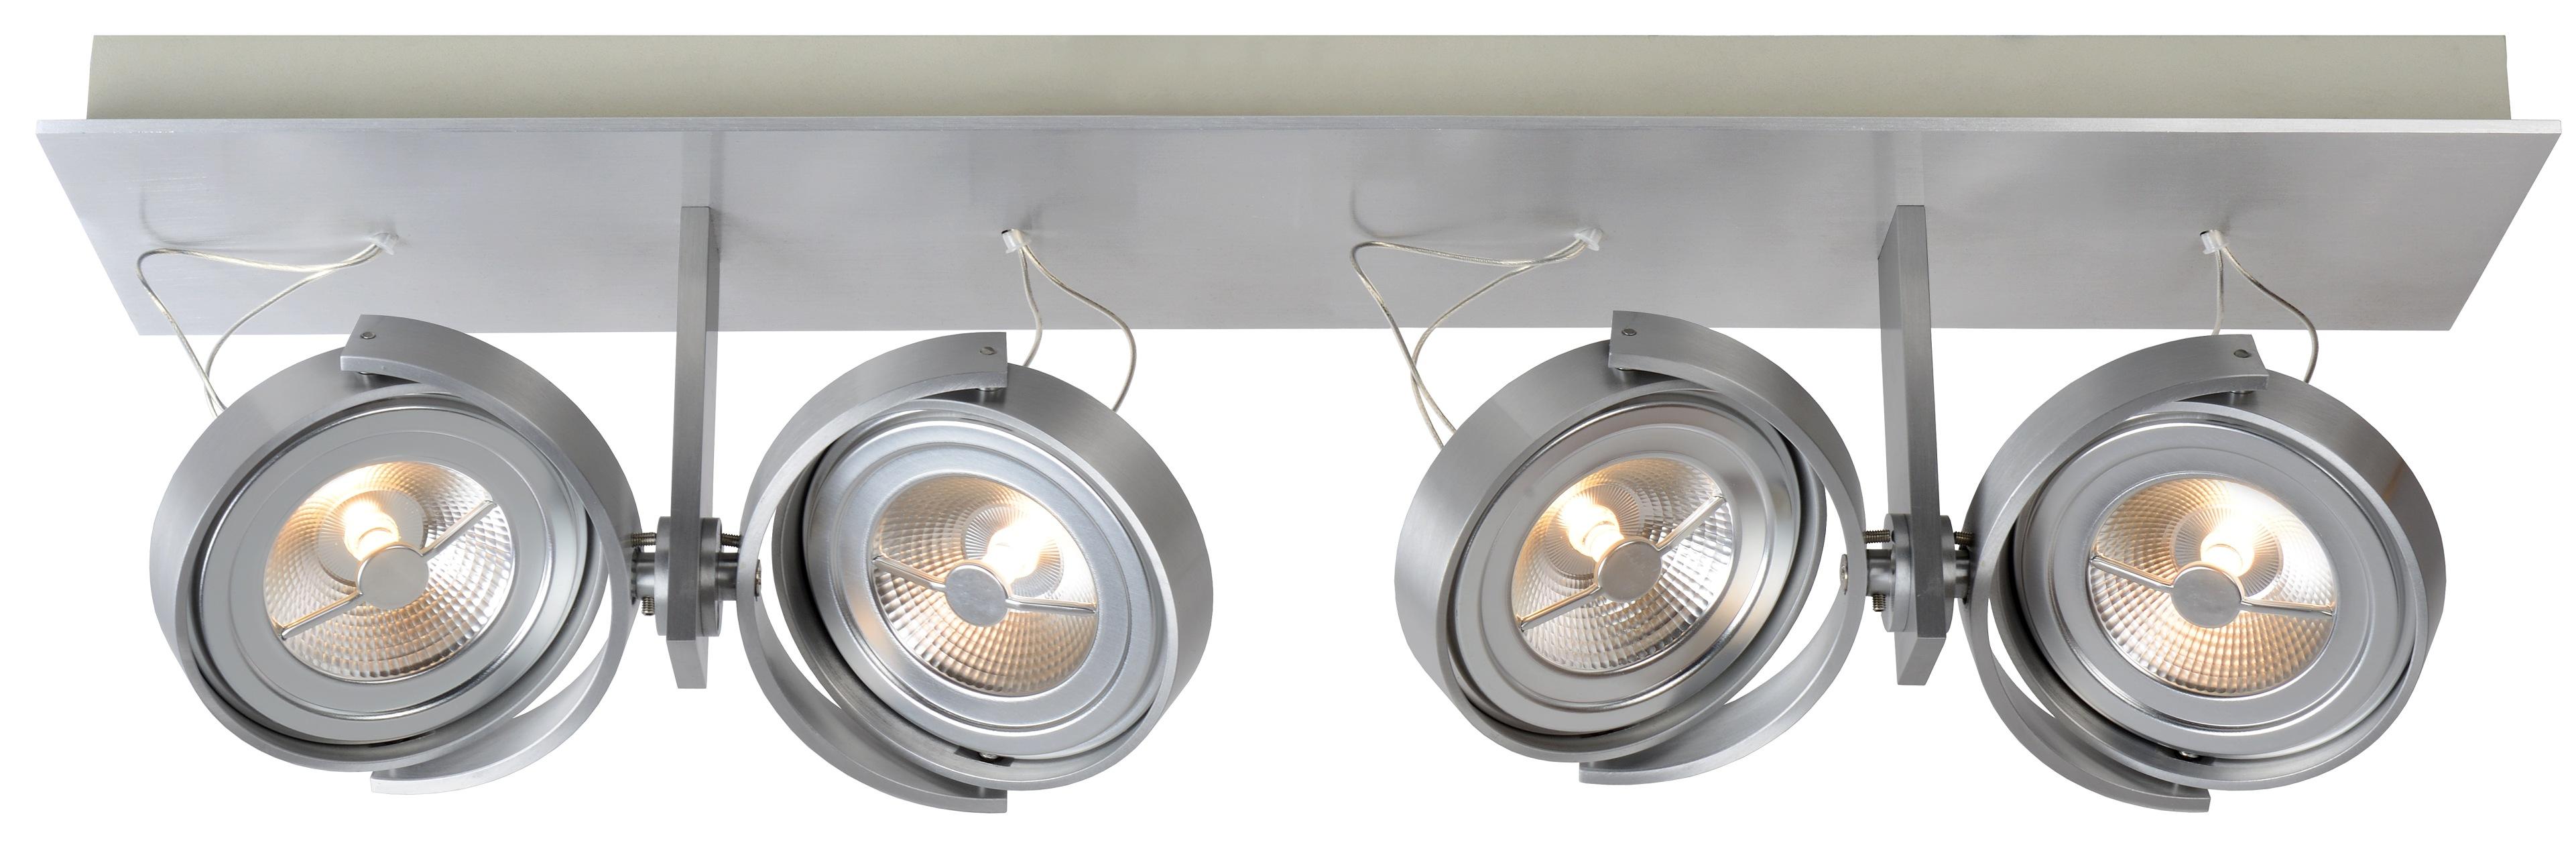 Lucide Plafondspot Spectrum 4 Spots - Dimbare LED - Aluminium